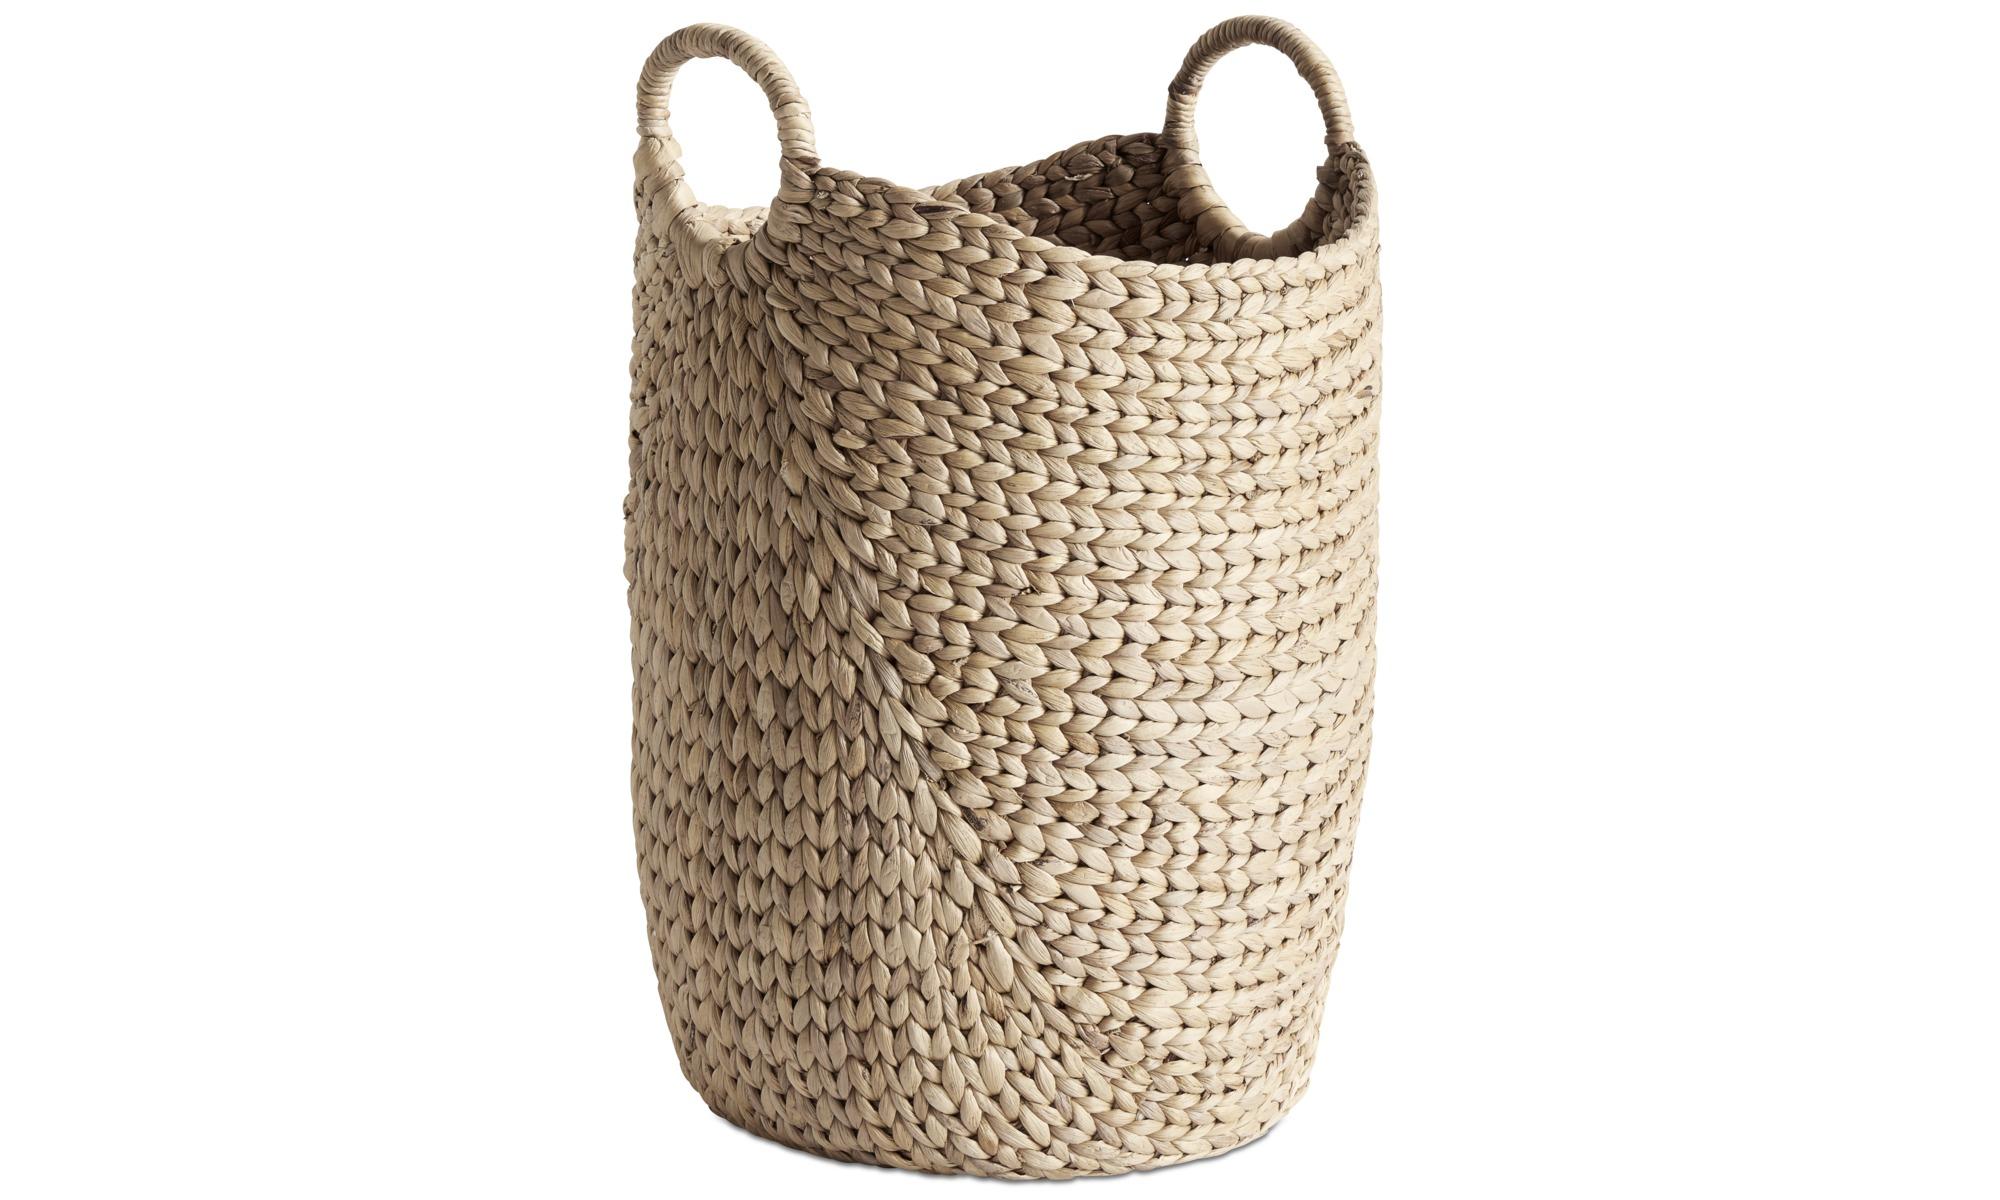 Small furniture - Hey basket - Beige - Glass